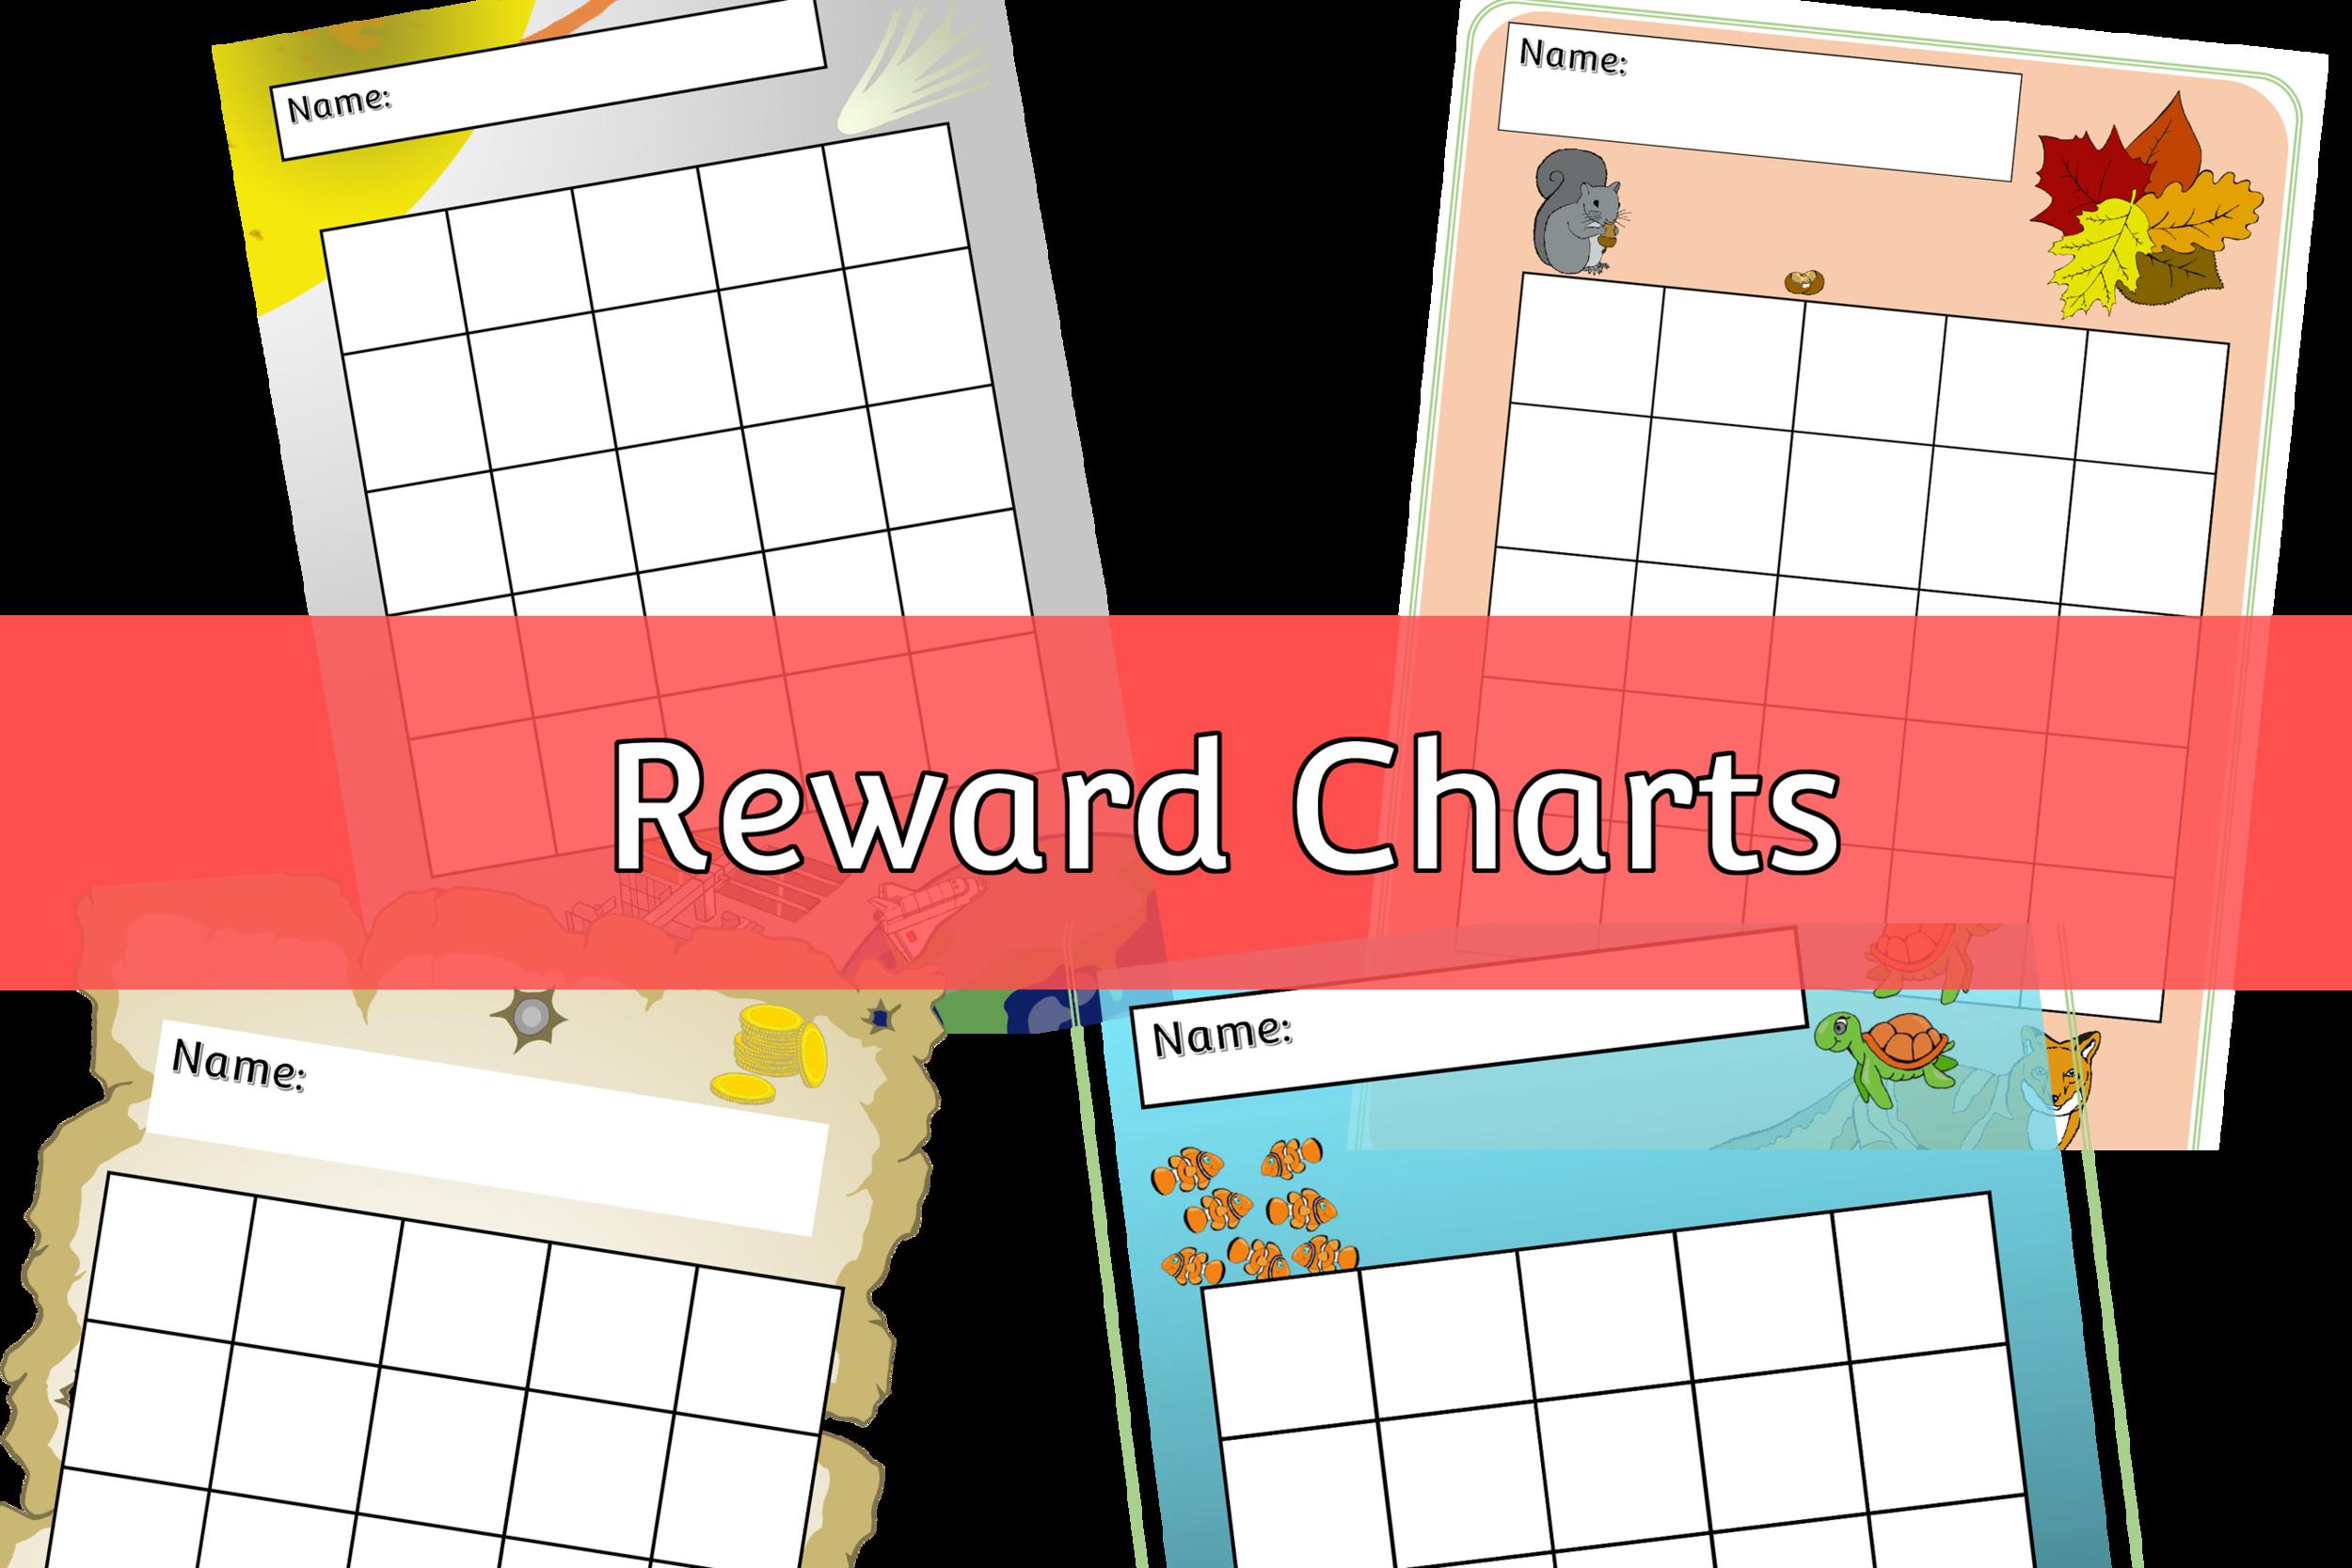 Reward Charts Cover.png